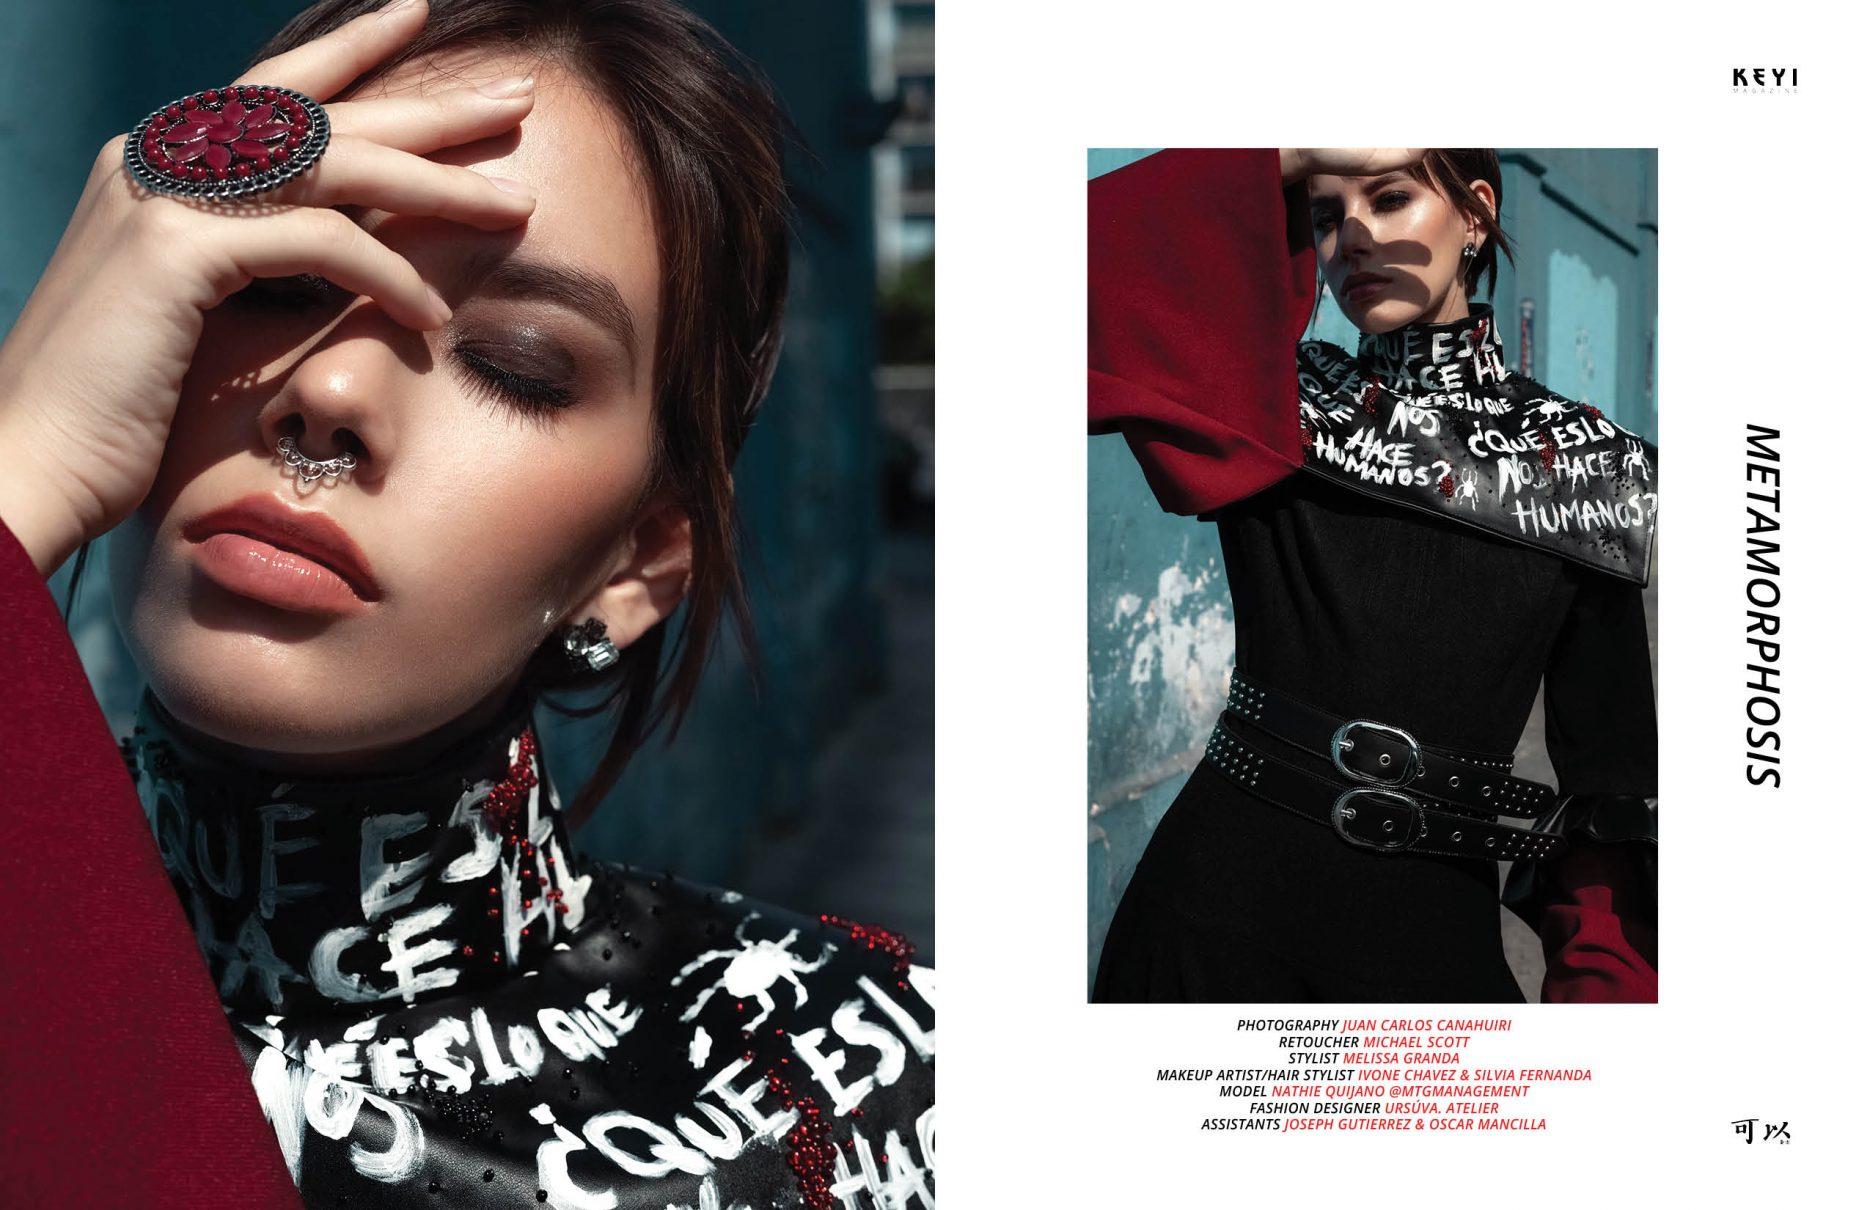 fashion shoot for keyi magazine